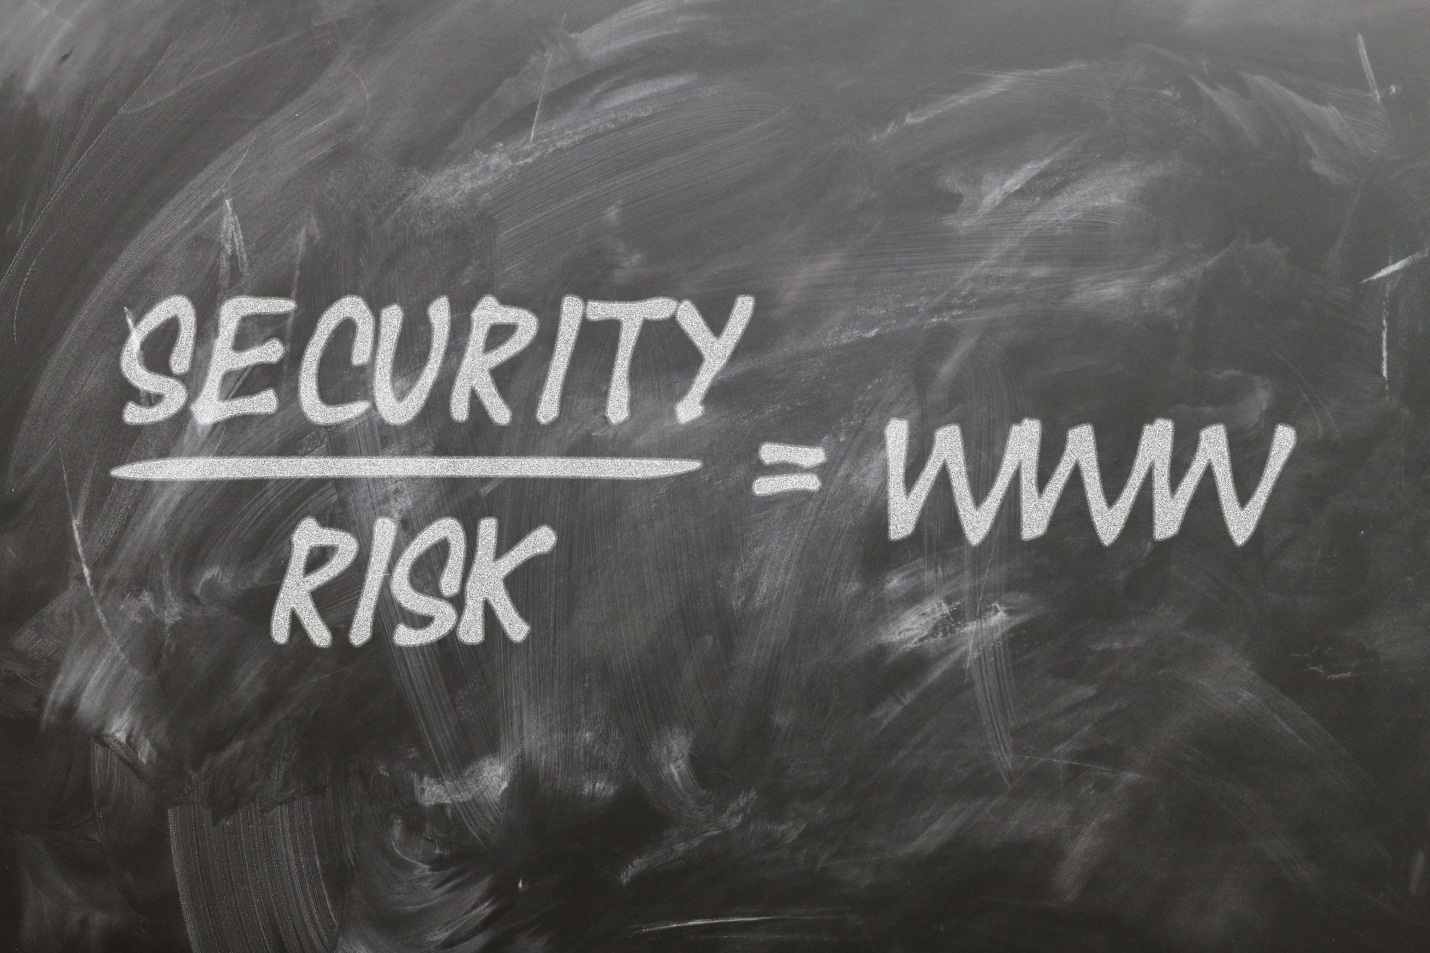 Internet = Security / Risk